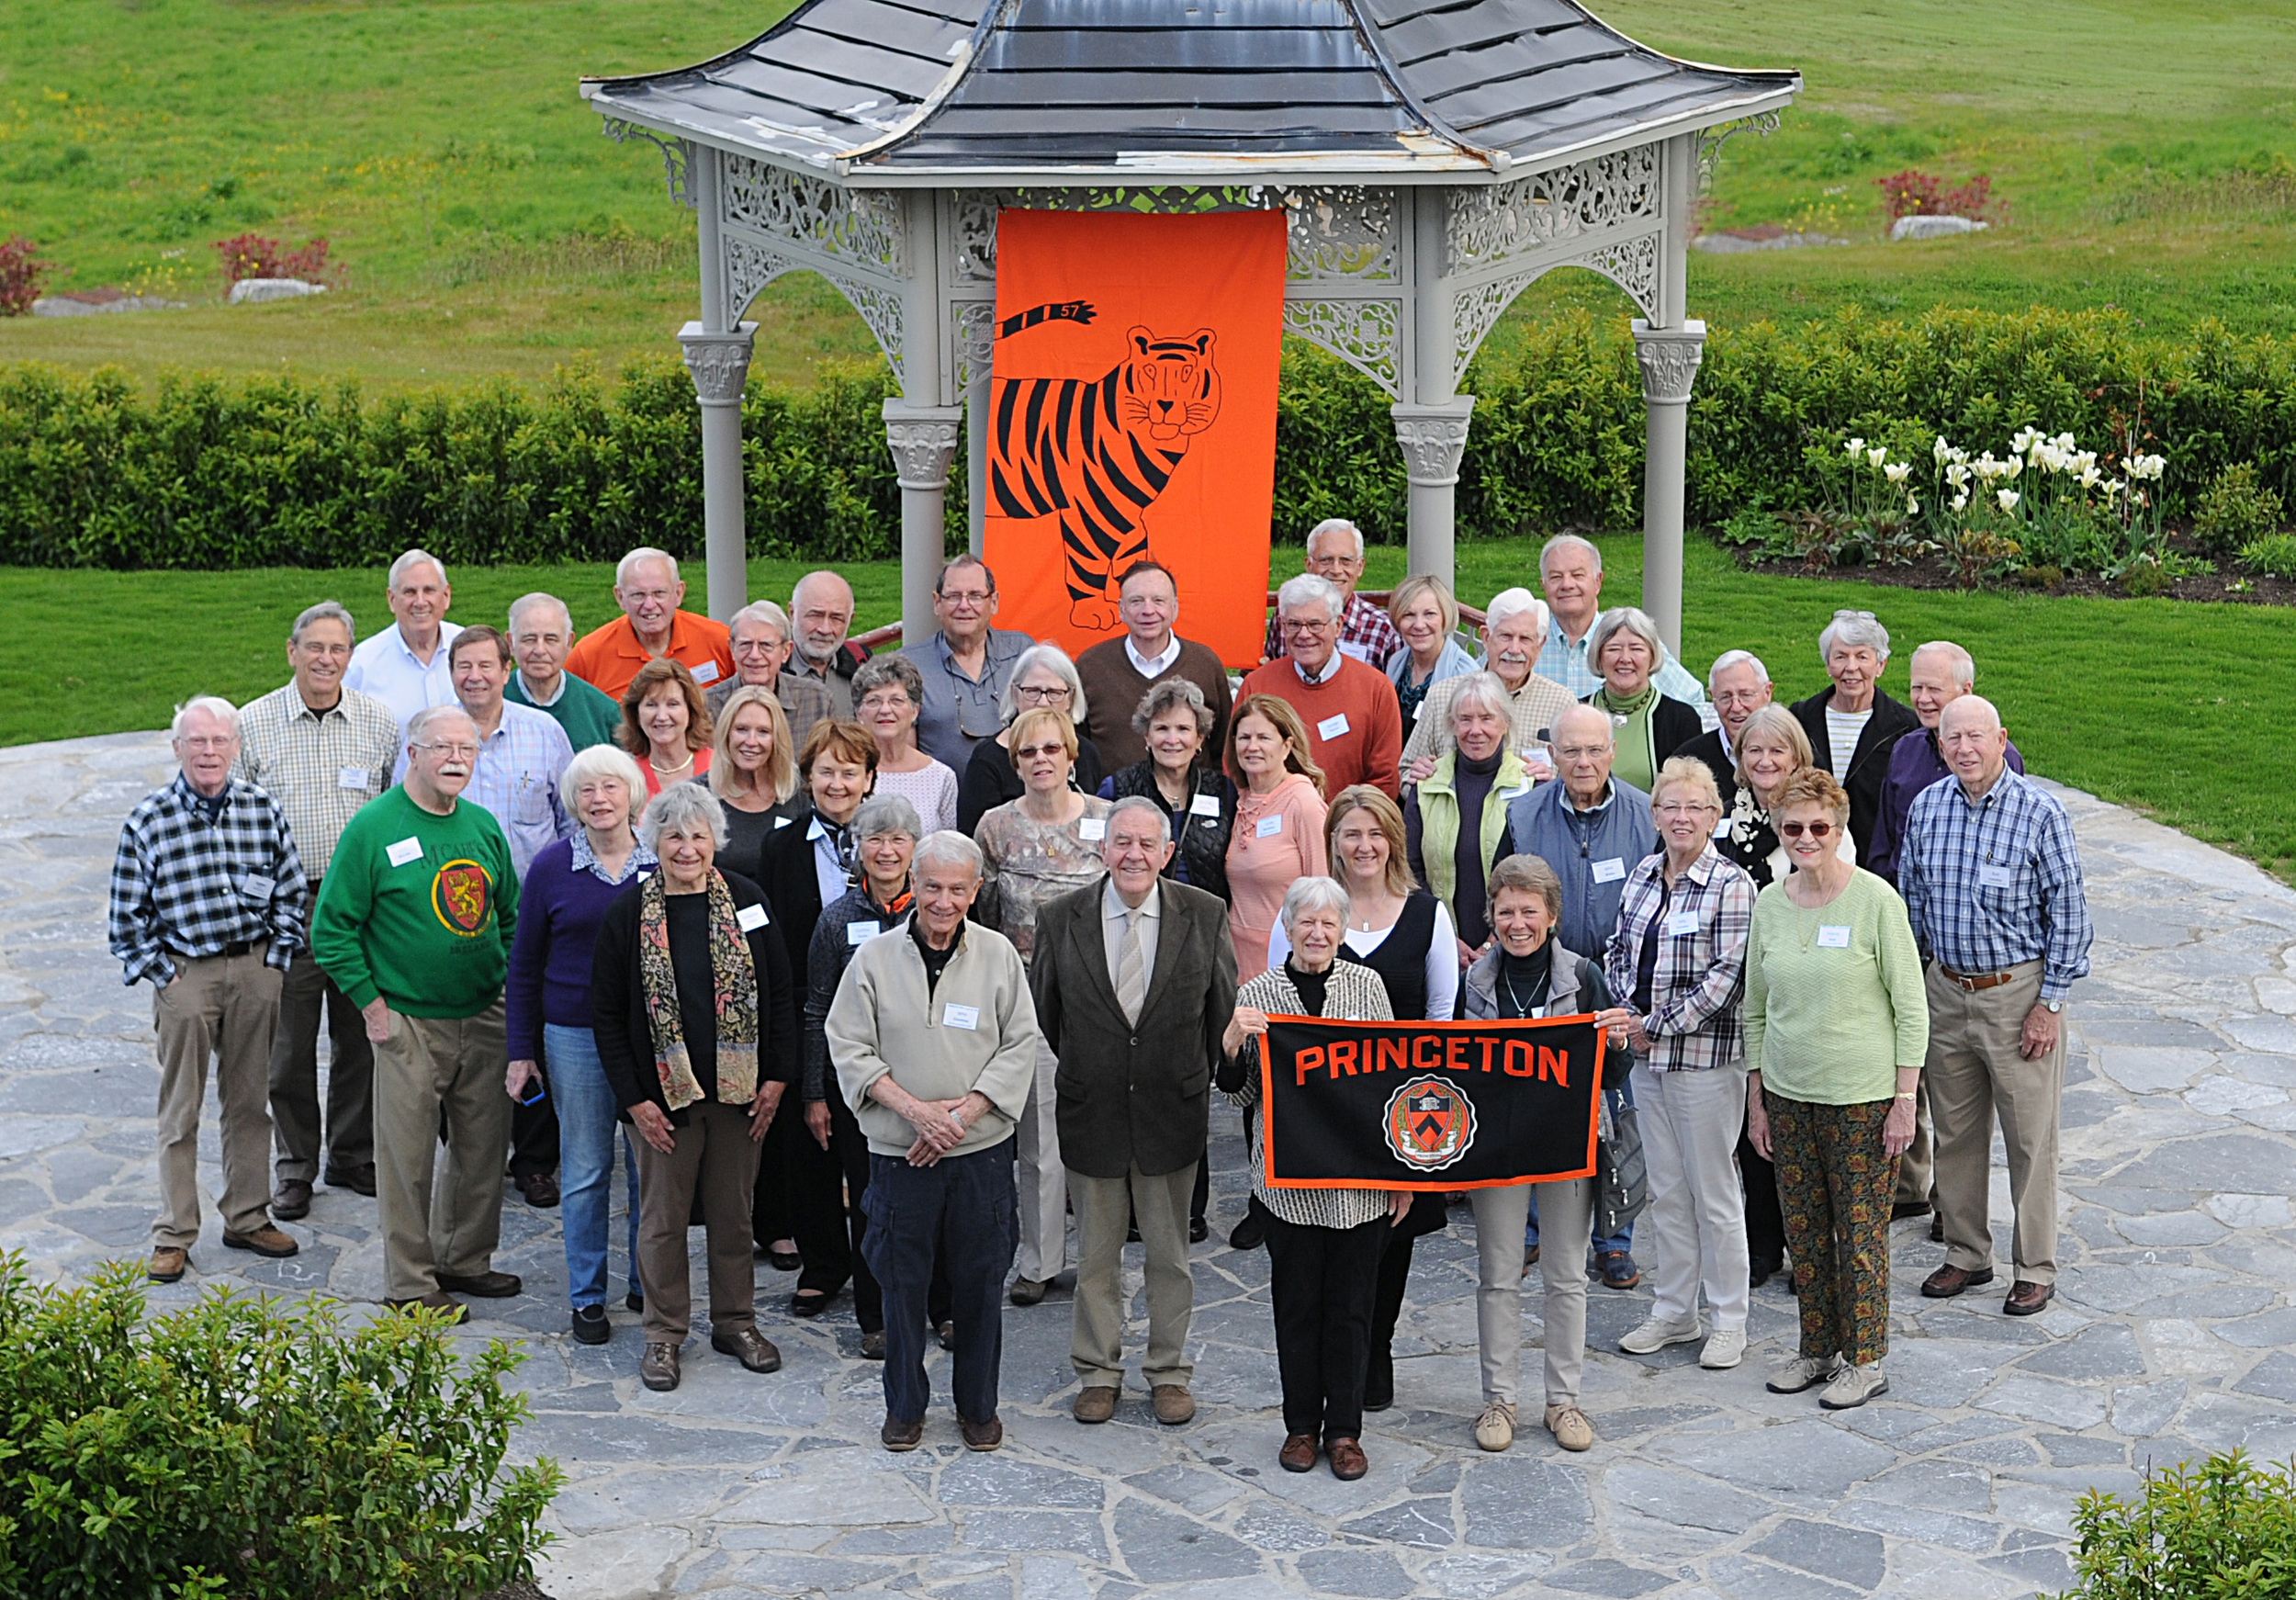 Princeton Alumni Mini Reunion Tour based at Glenlo Abbey Hotel